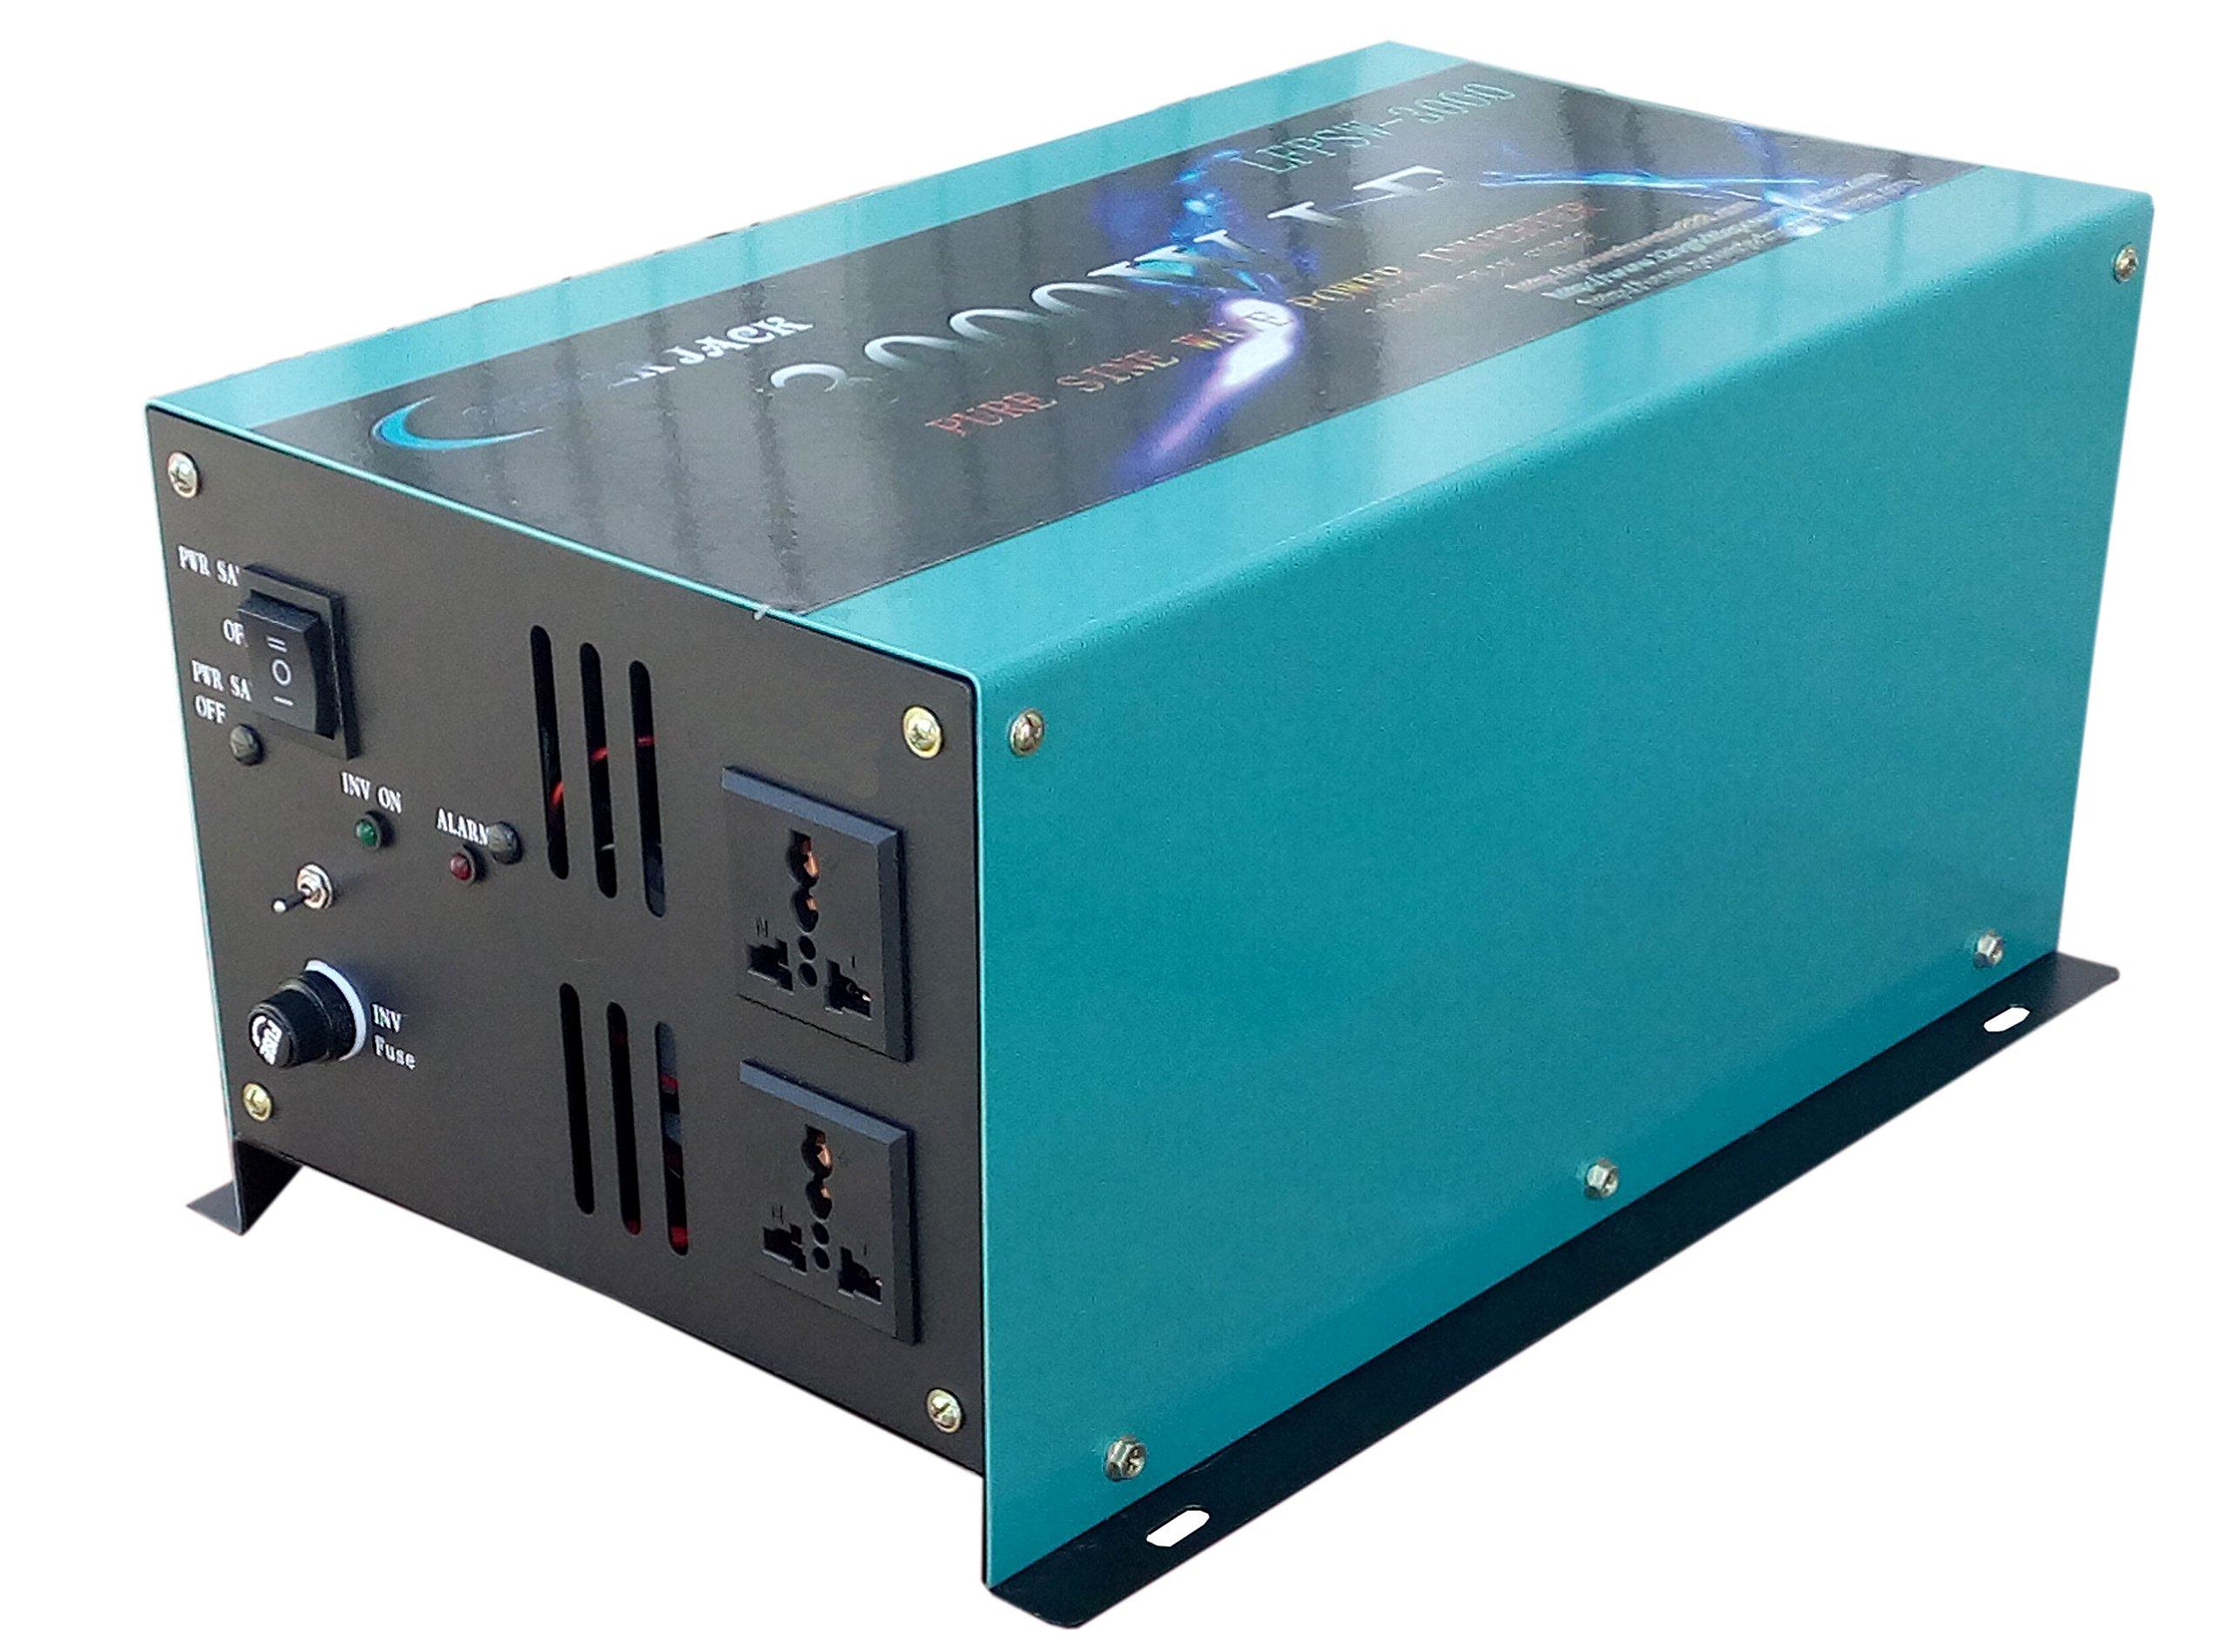 12000W peak 3000W LF Pure Sine Wave Power Inverter DC 12V to AC 110V 60Hz